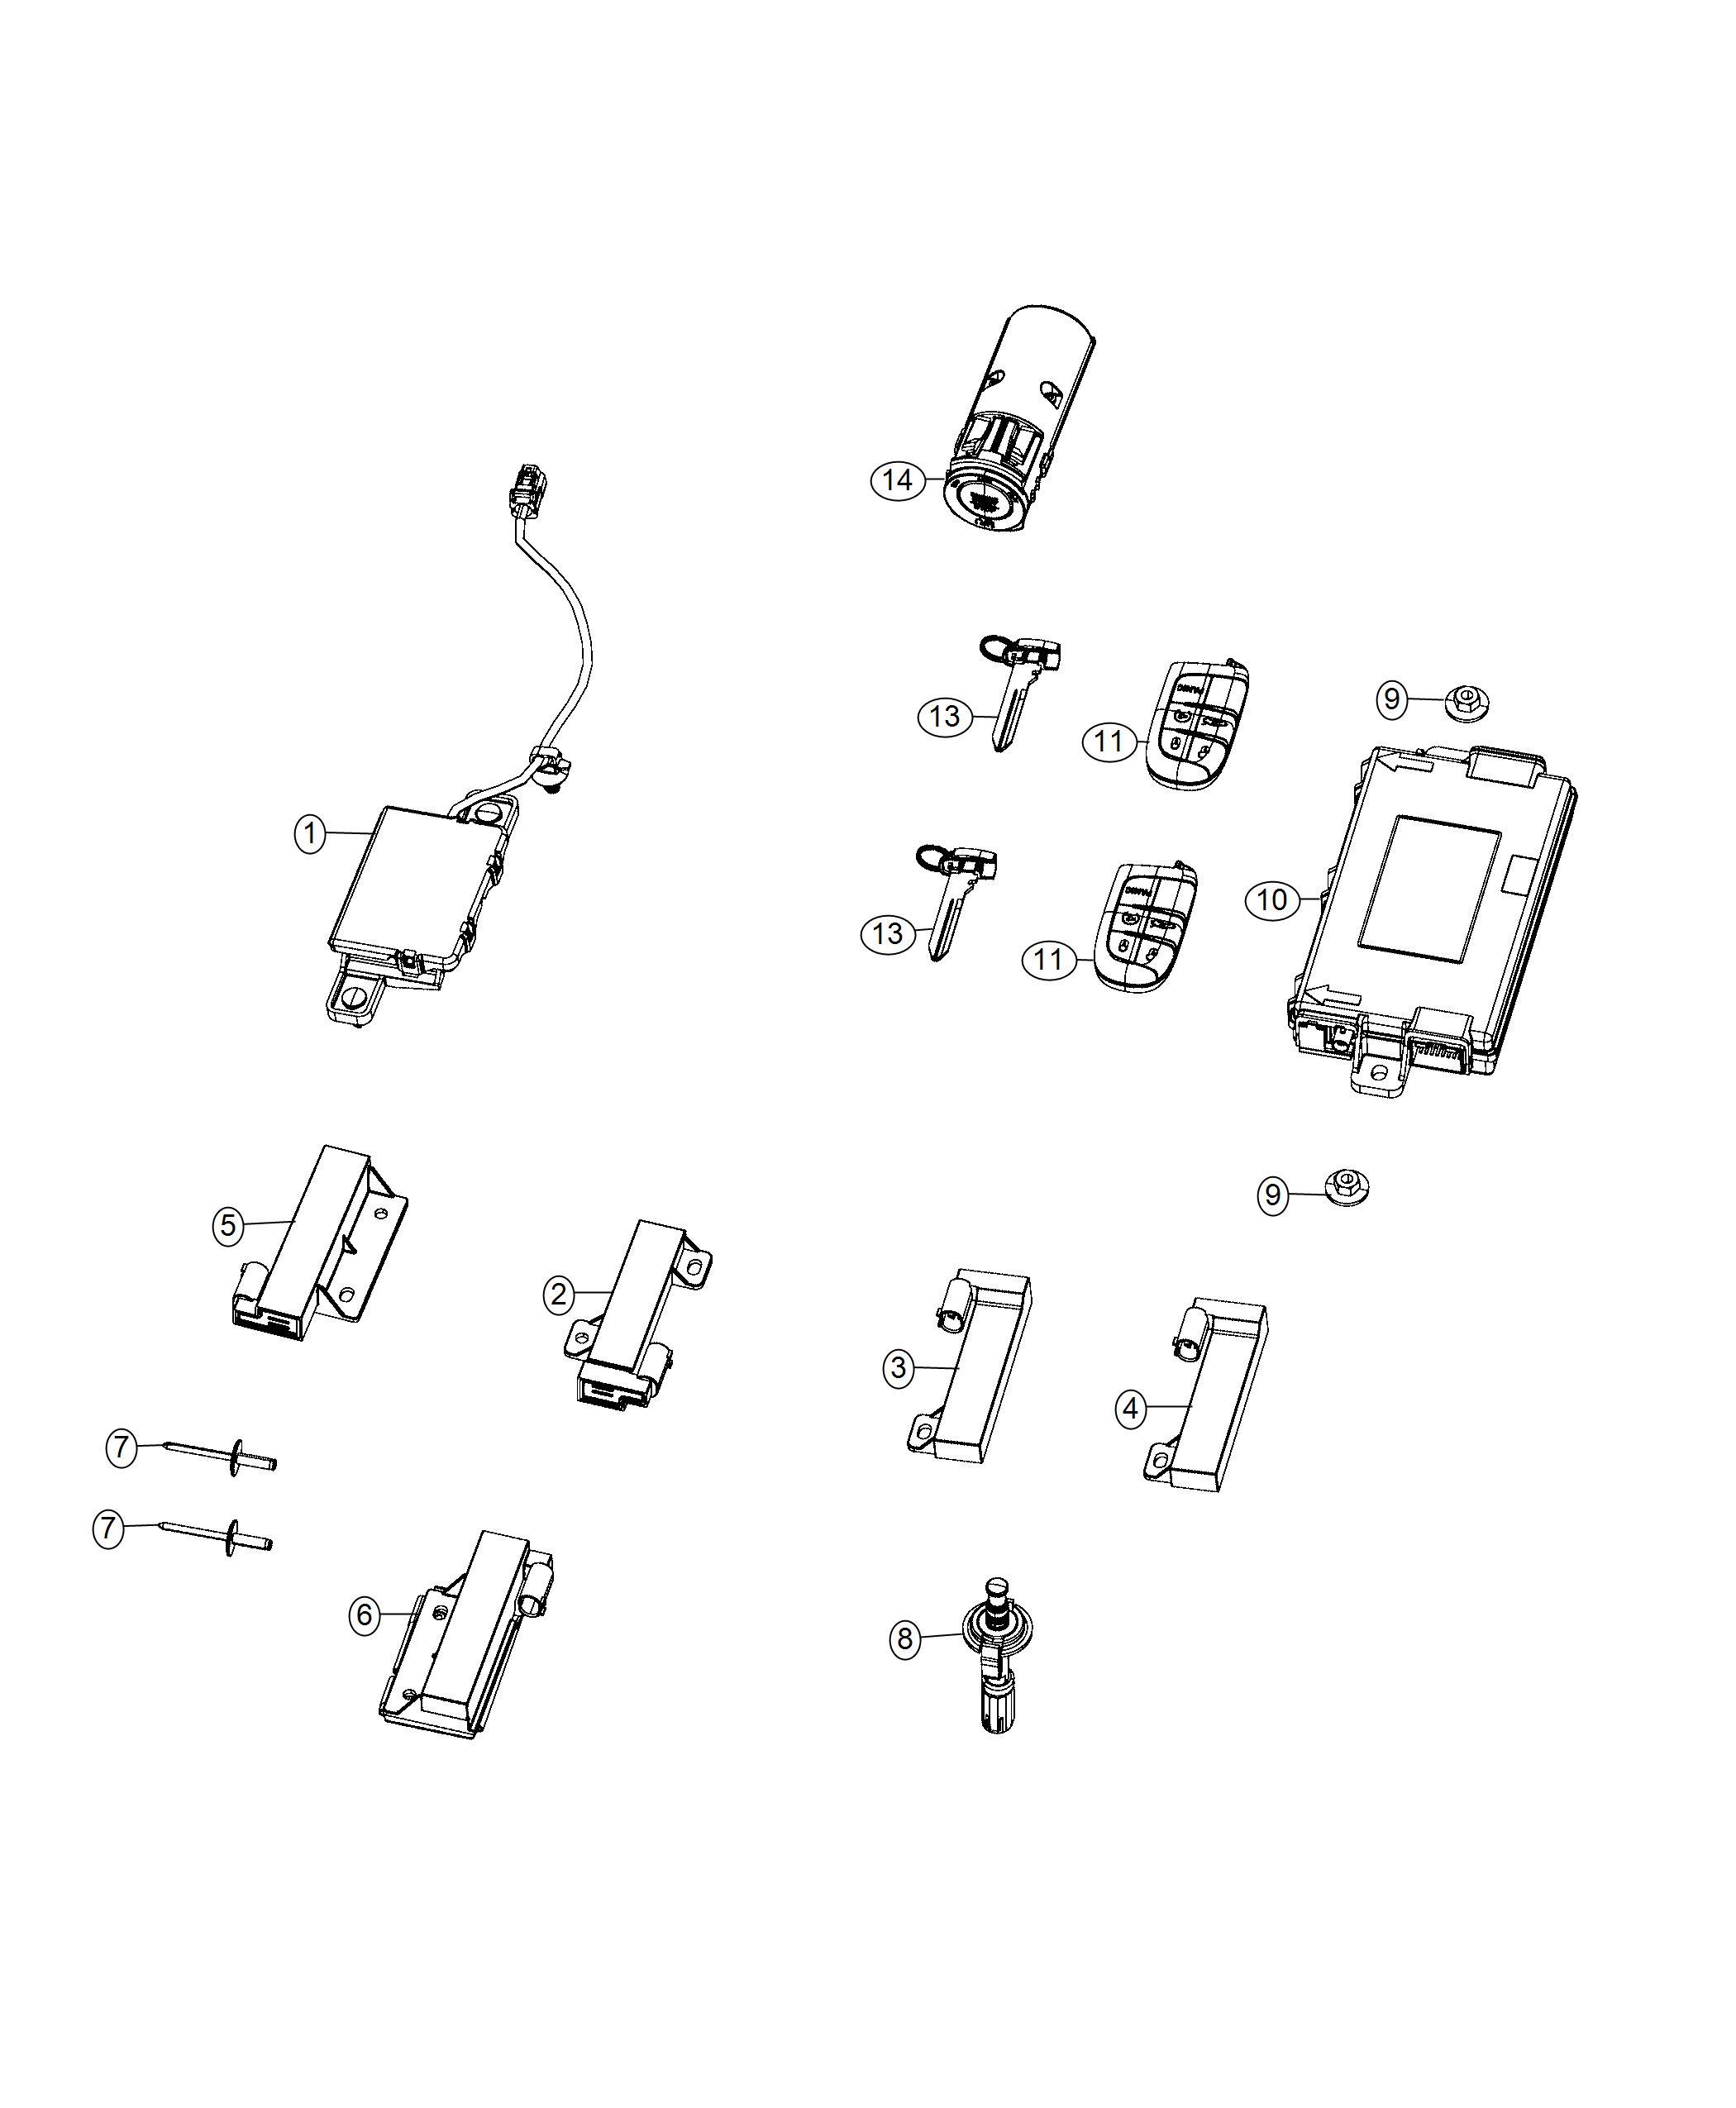 dodge challenger transmitter  integrated key fob   do not use body model